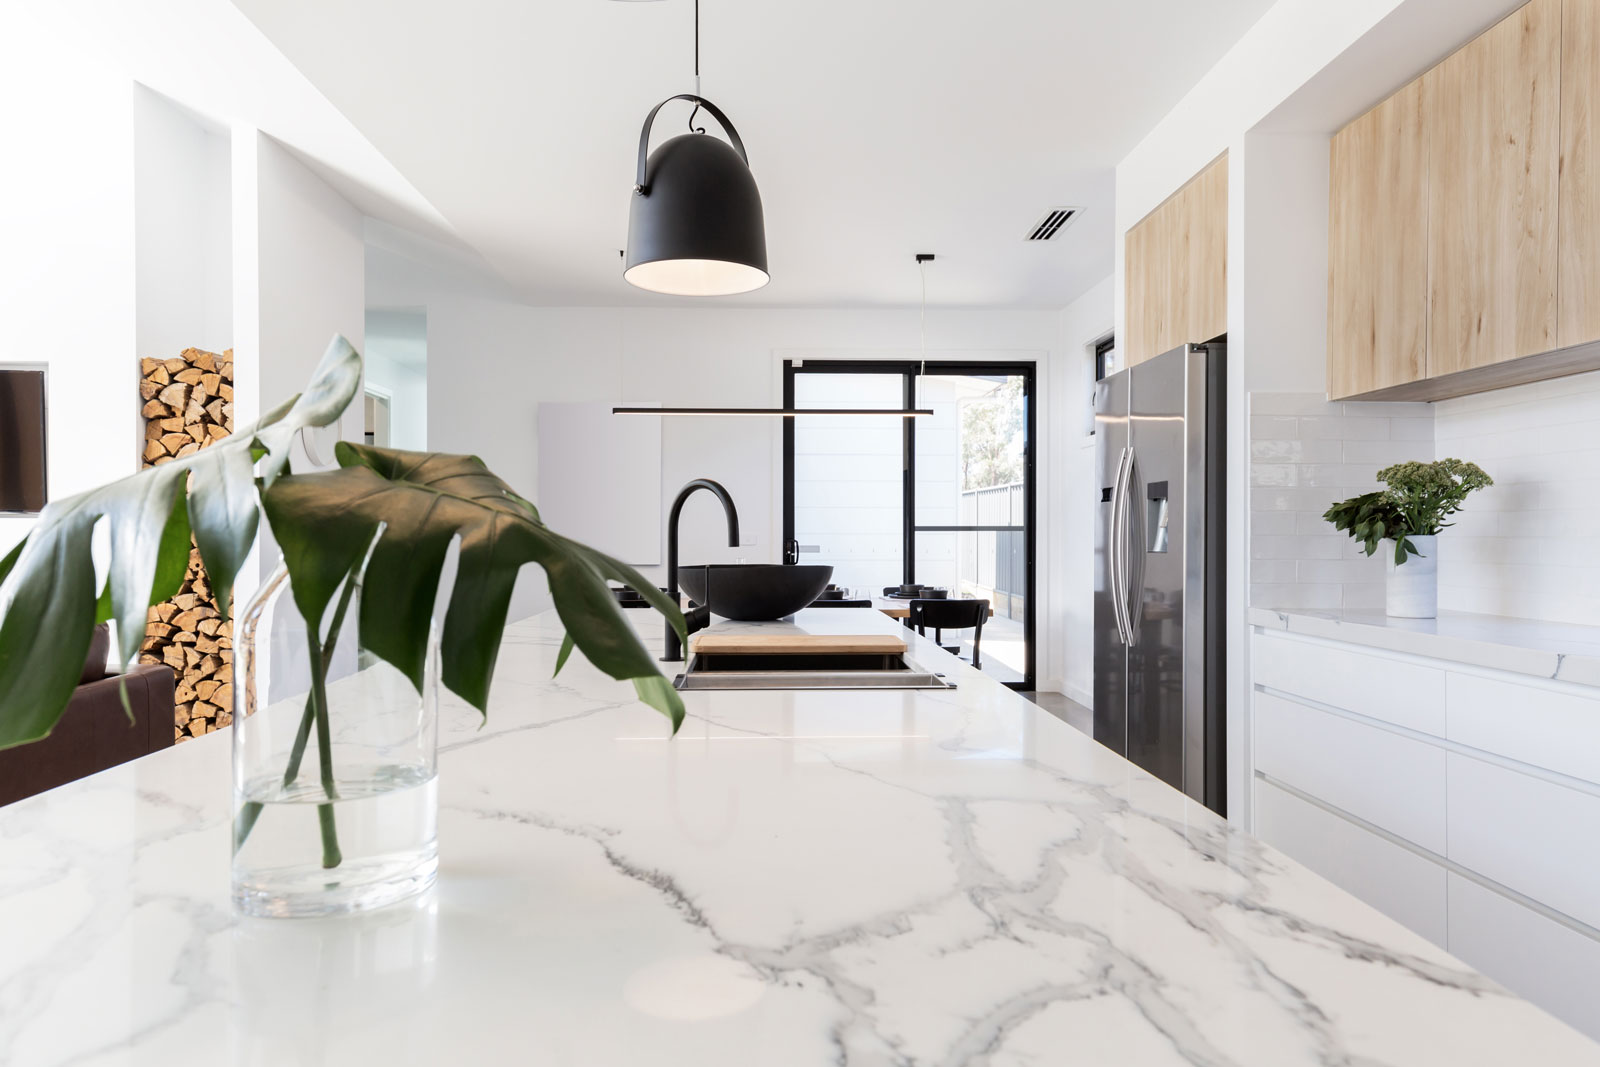 Top cucina marmo